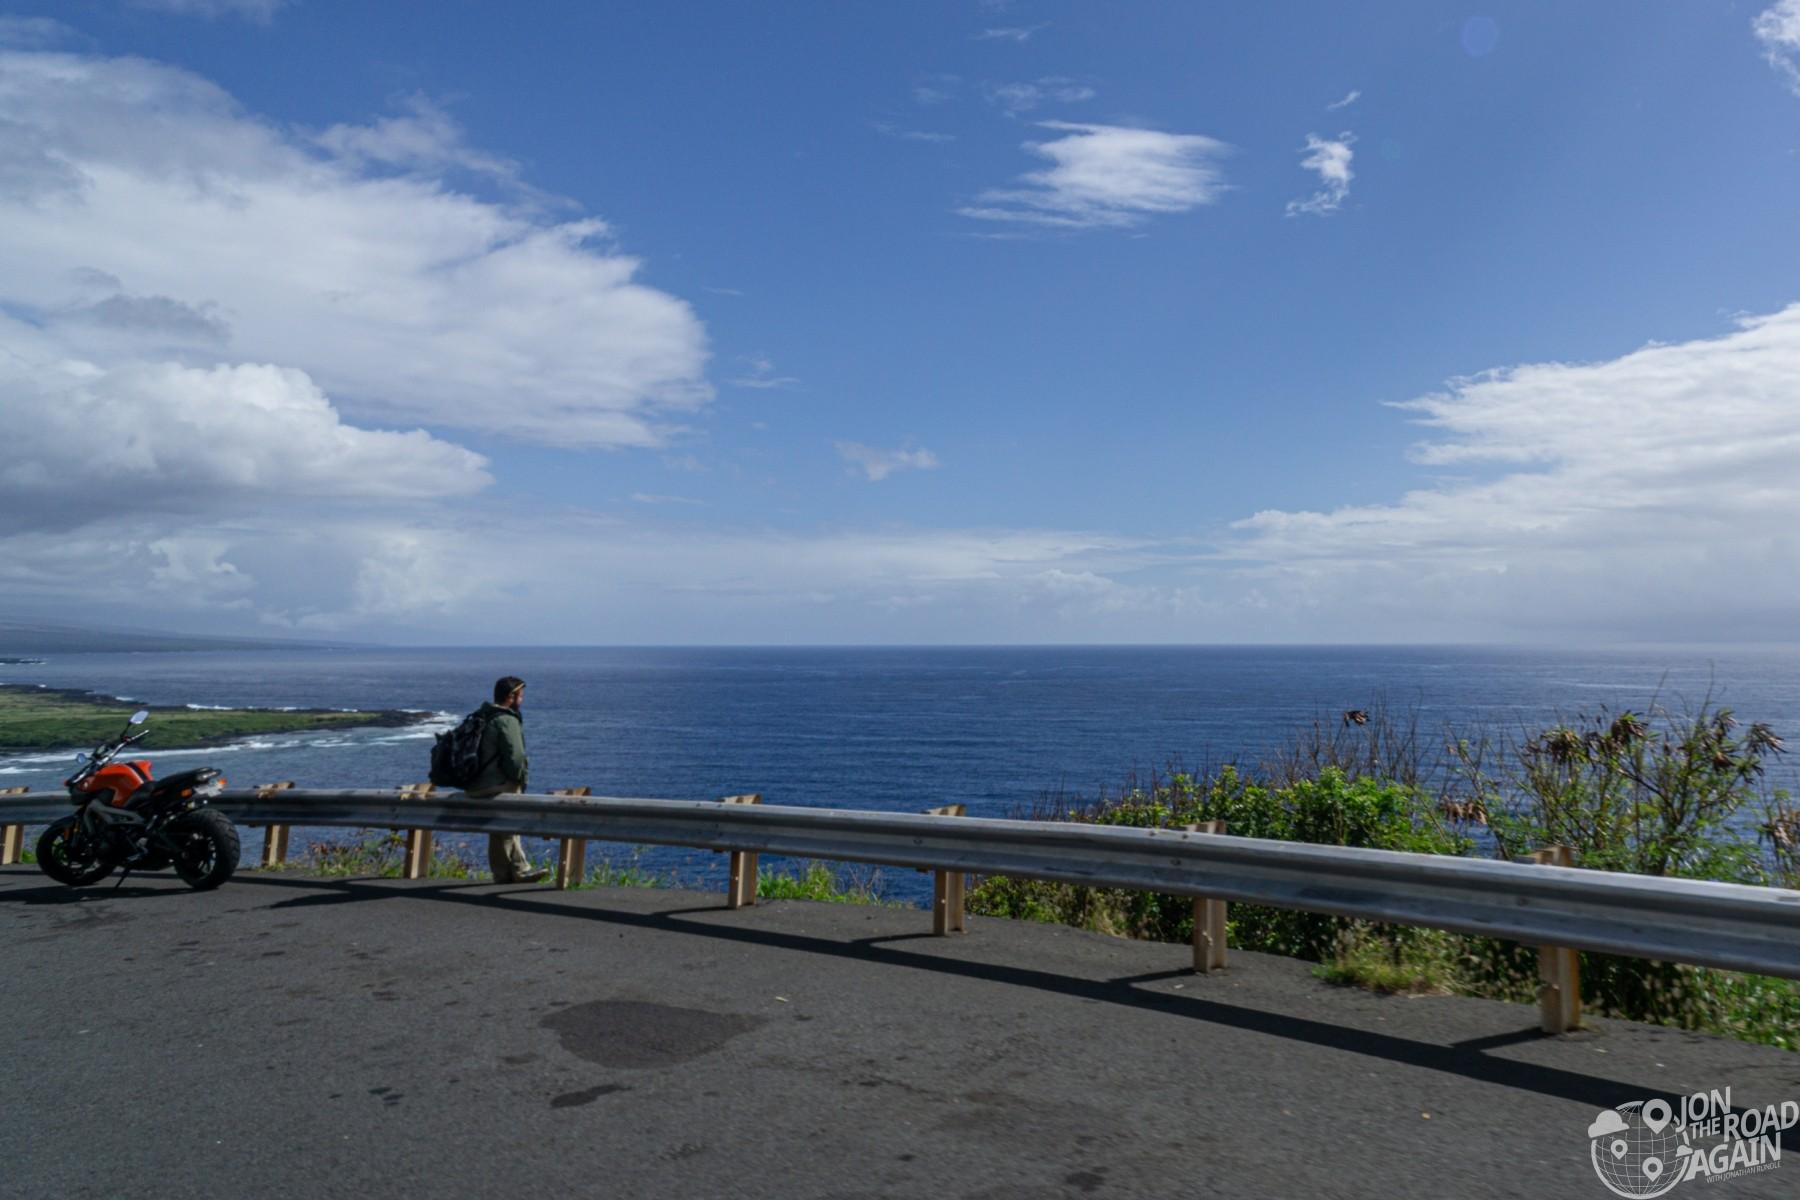 Motorcyclist on Big Island Coastline